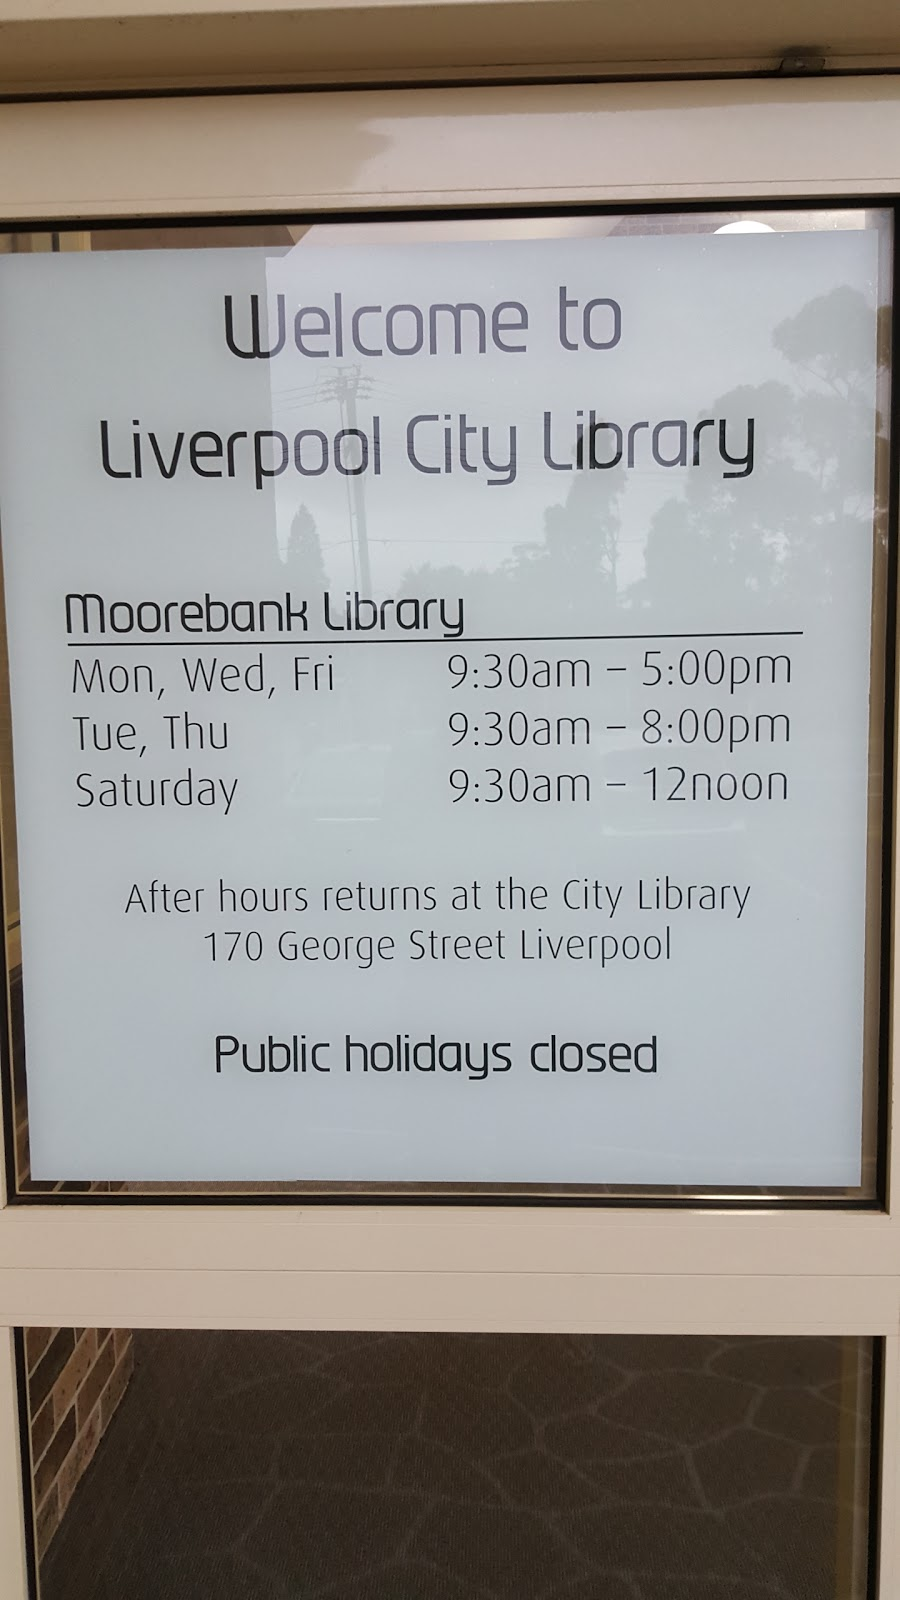 Moorebank Library | library | Nuwarra Rd &, Maddecks Ave, Moorebank NSW 2170, Australia | 0287117250 OR +61 2 8711 7250